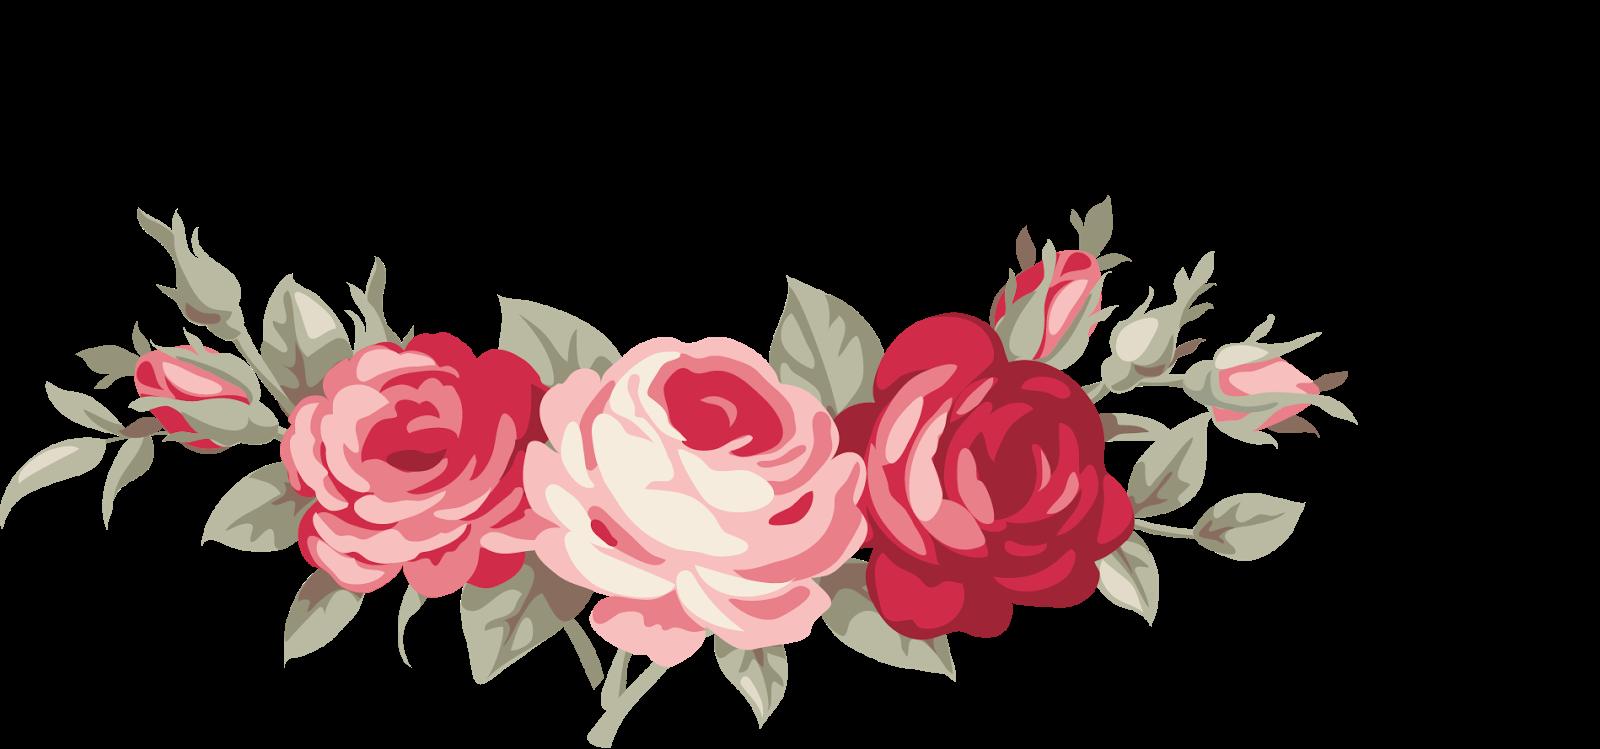 Gratis Arabesco Floral Para Baixar Meu Canto Floral